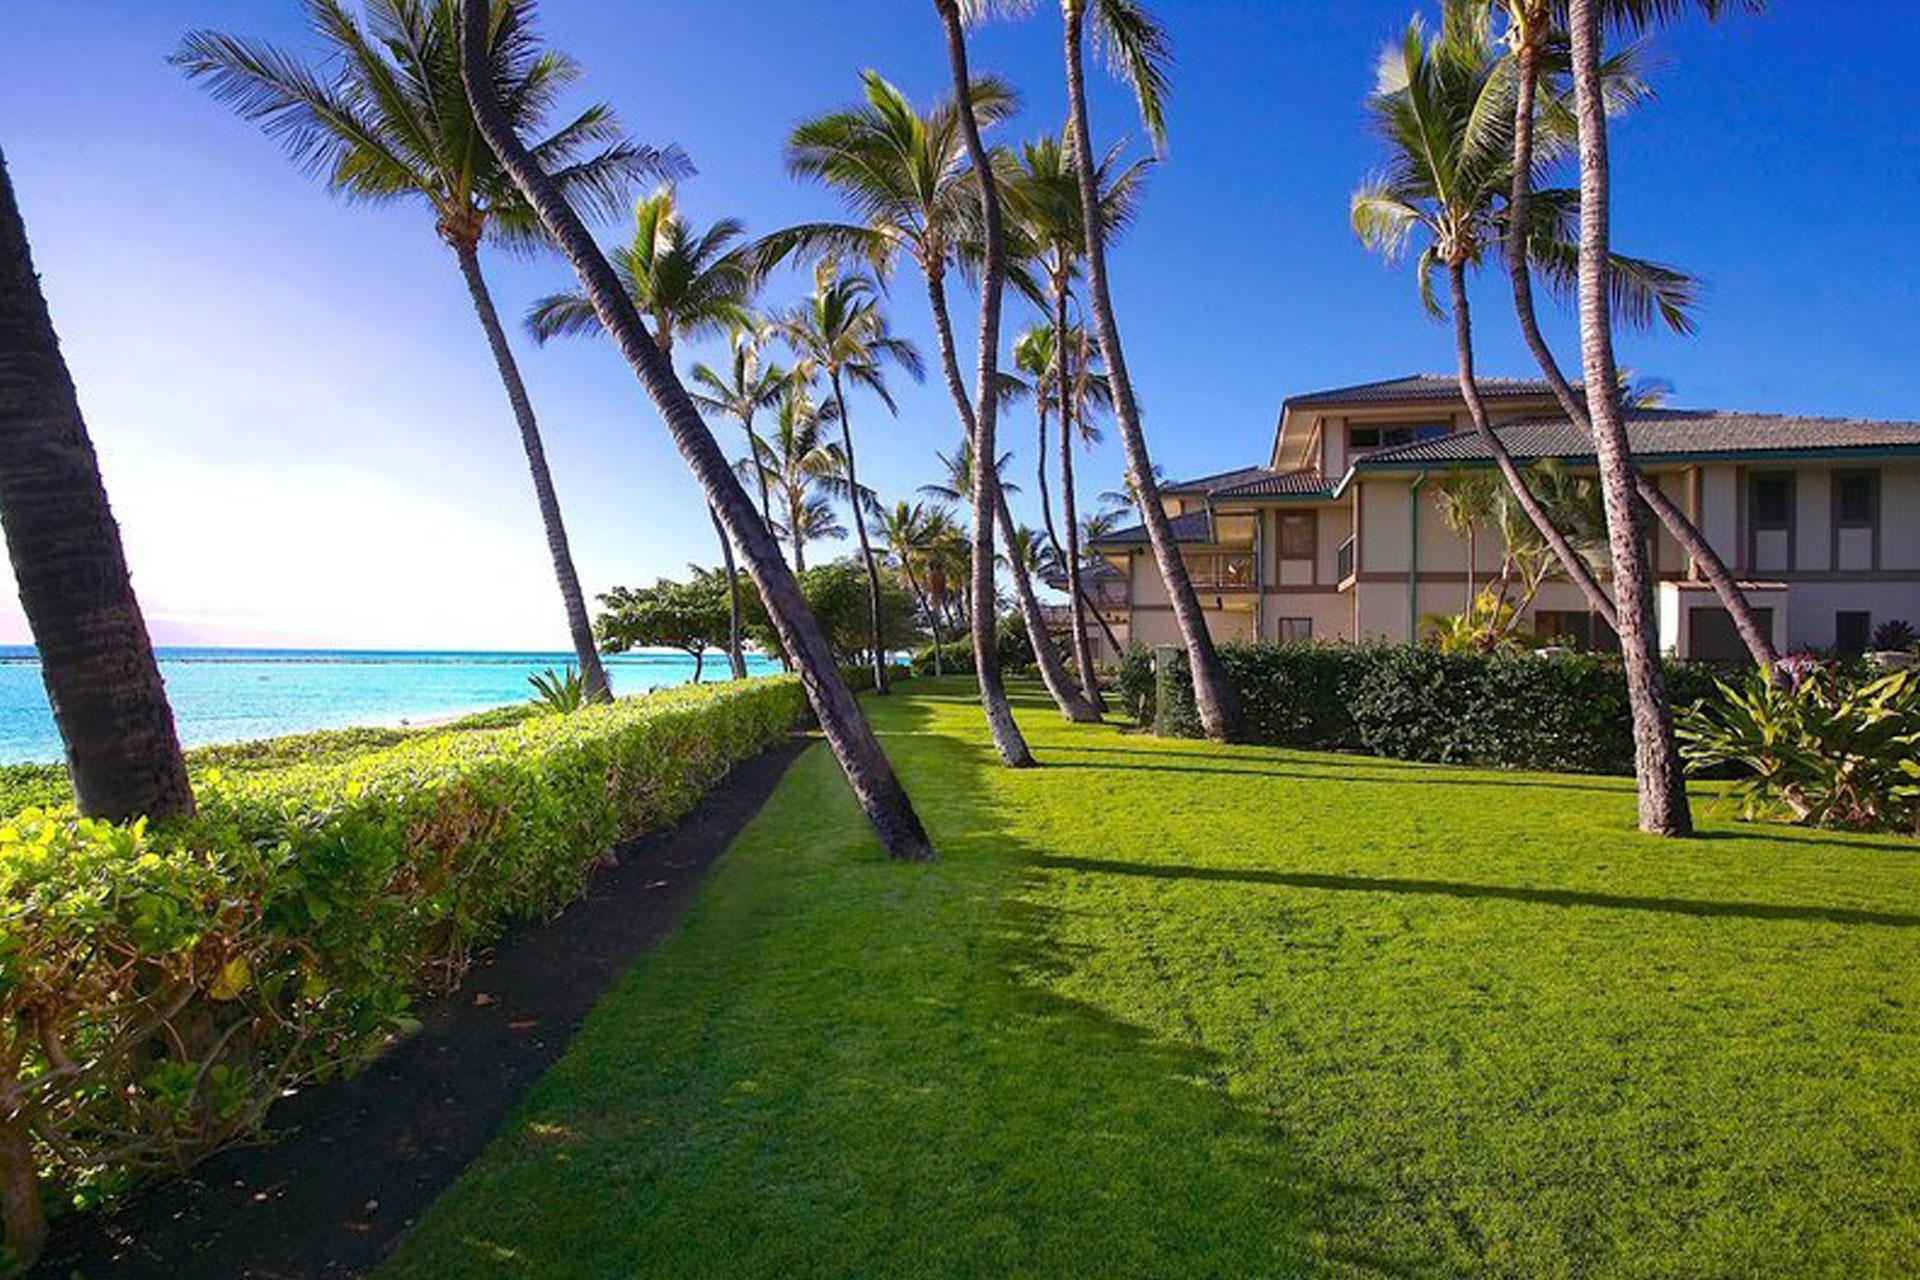 Puunoa Beach Estates; Courtesy of Puunoa Beach Estates